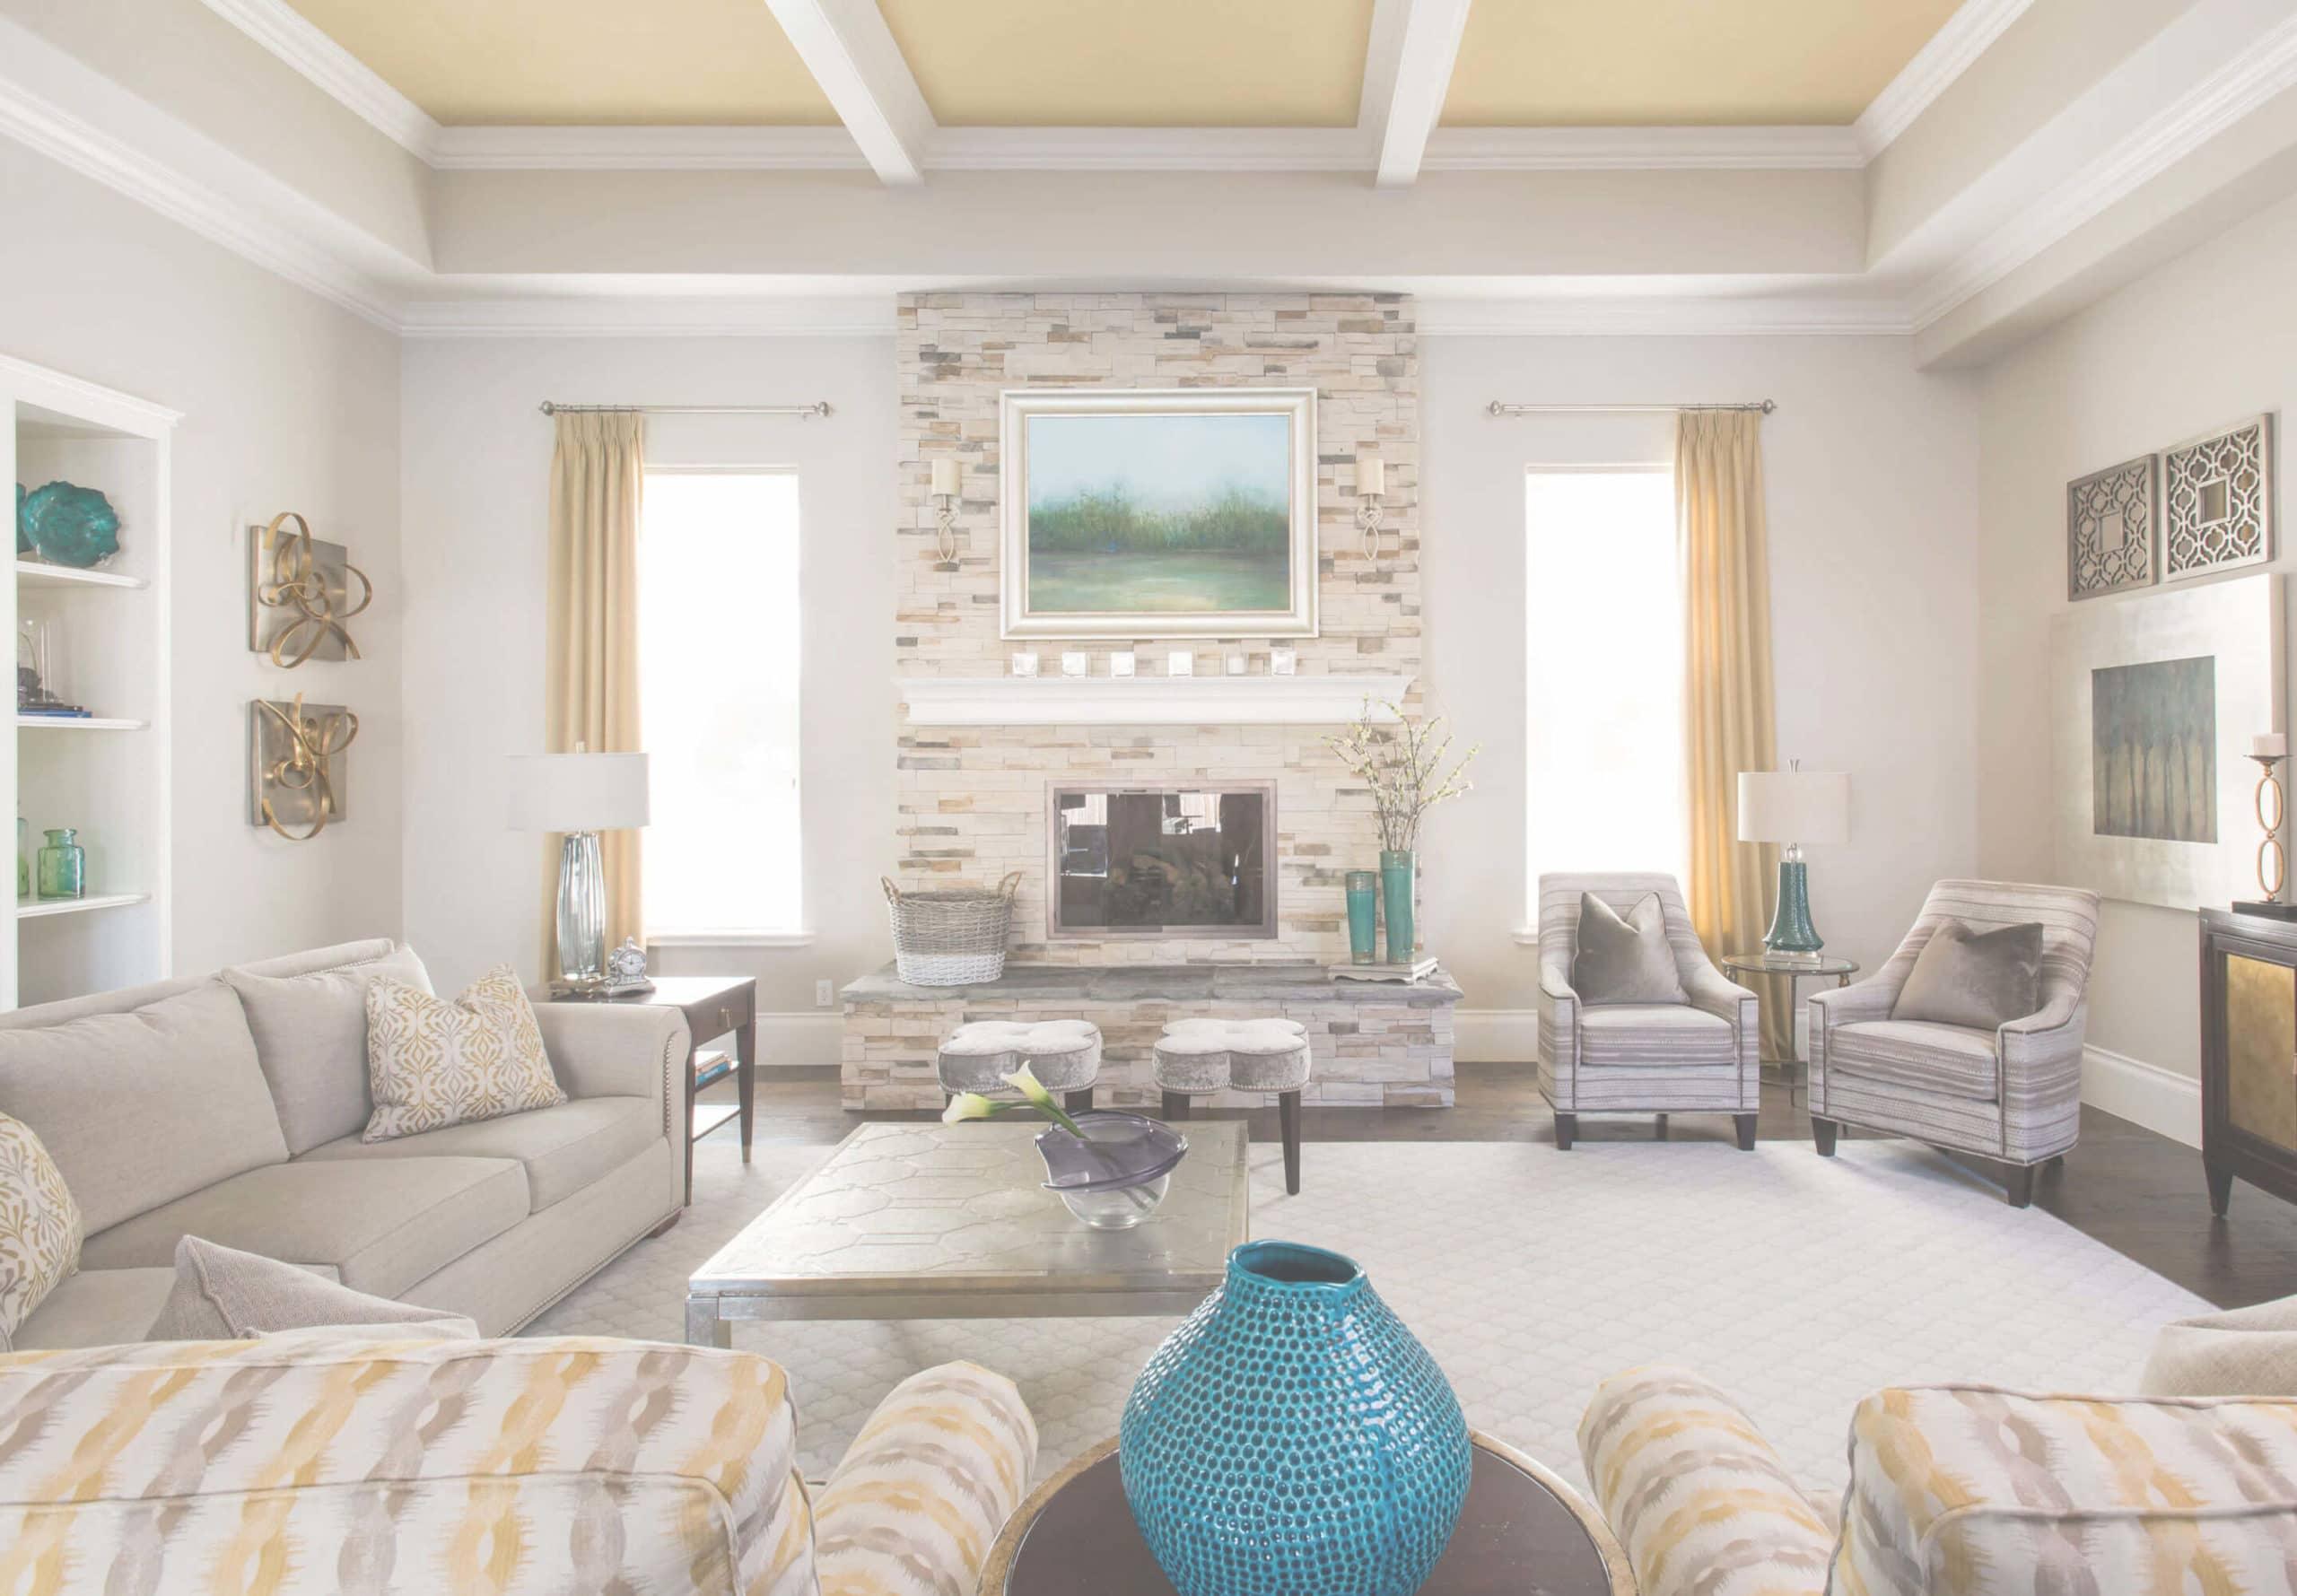 Home 2 - Dallas Interior Designer serving Plano, Frisco, Dallas, Allen for Decorating Den Interiors D'KOR HOME by Dee Frazier Interiors